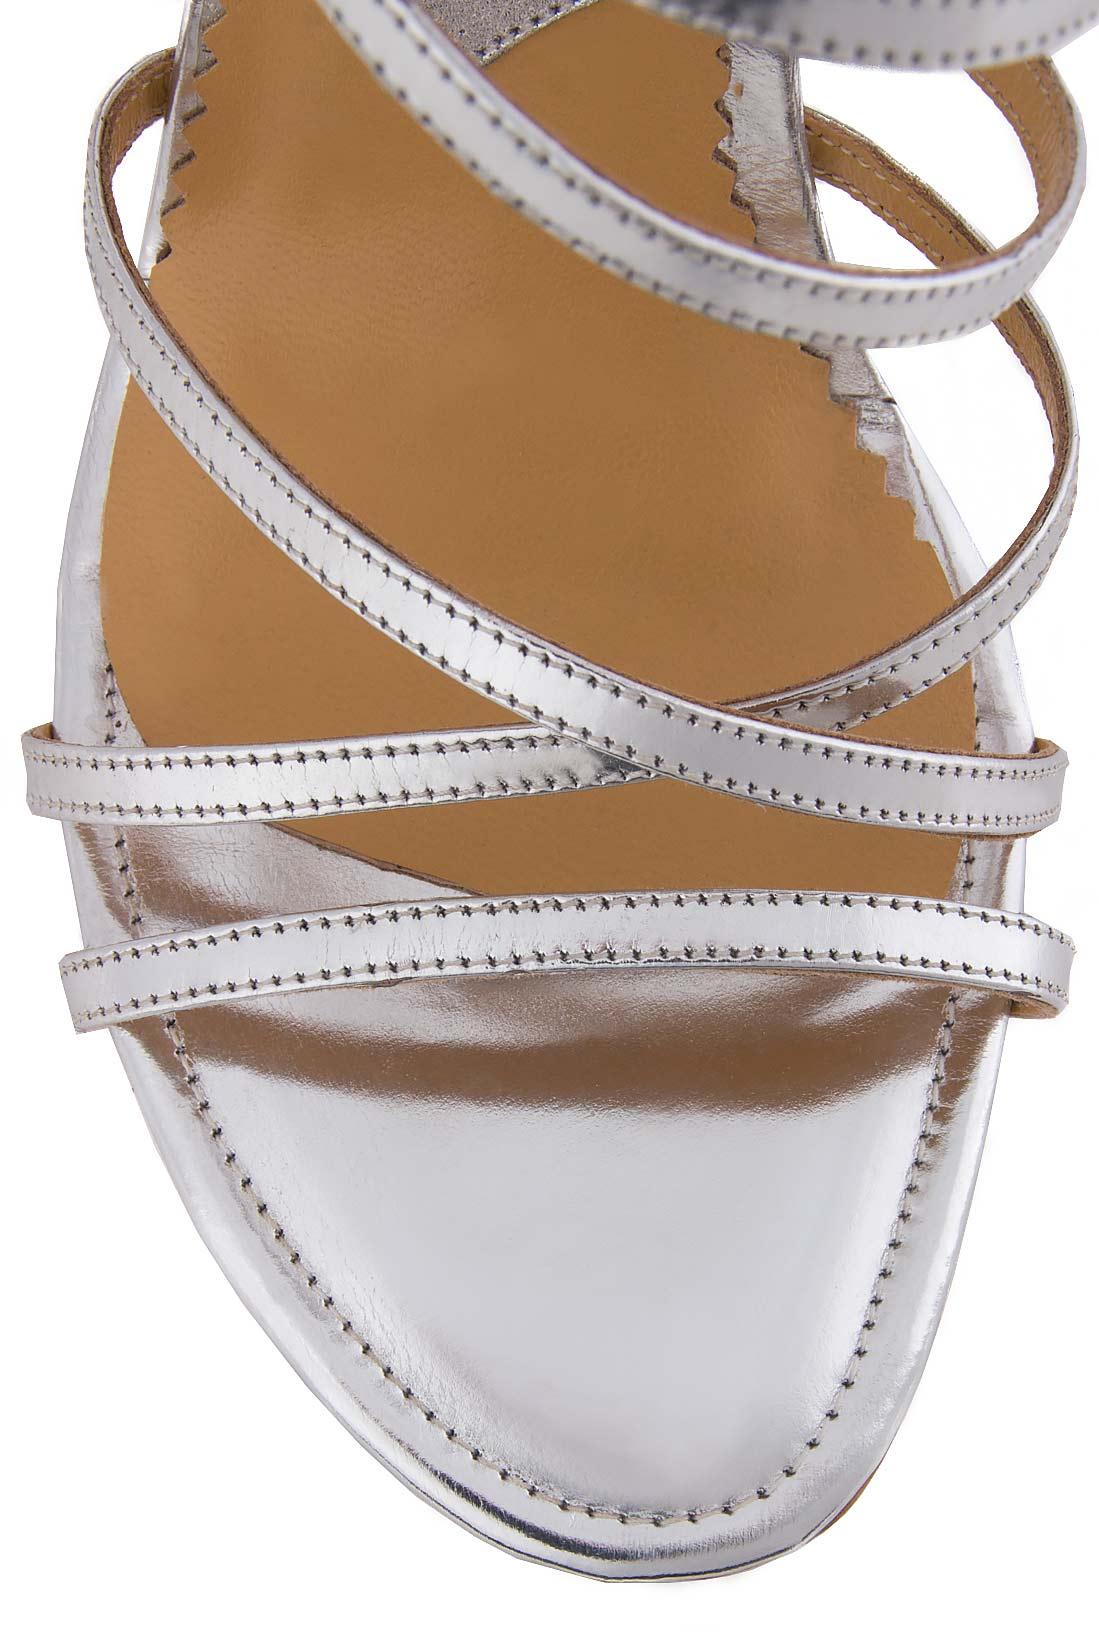 Sandale din piele metalizata Mihai Albu imagine 3